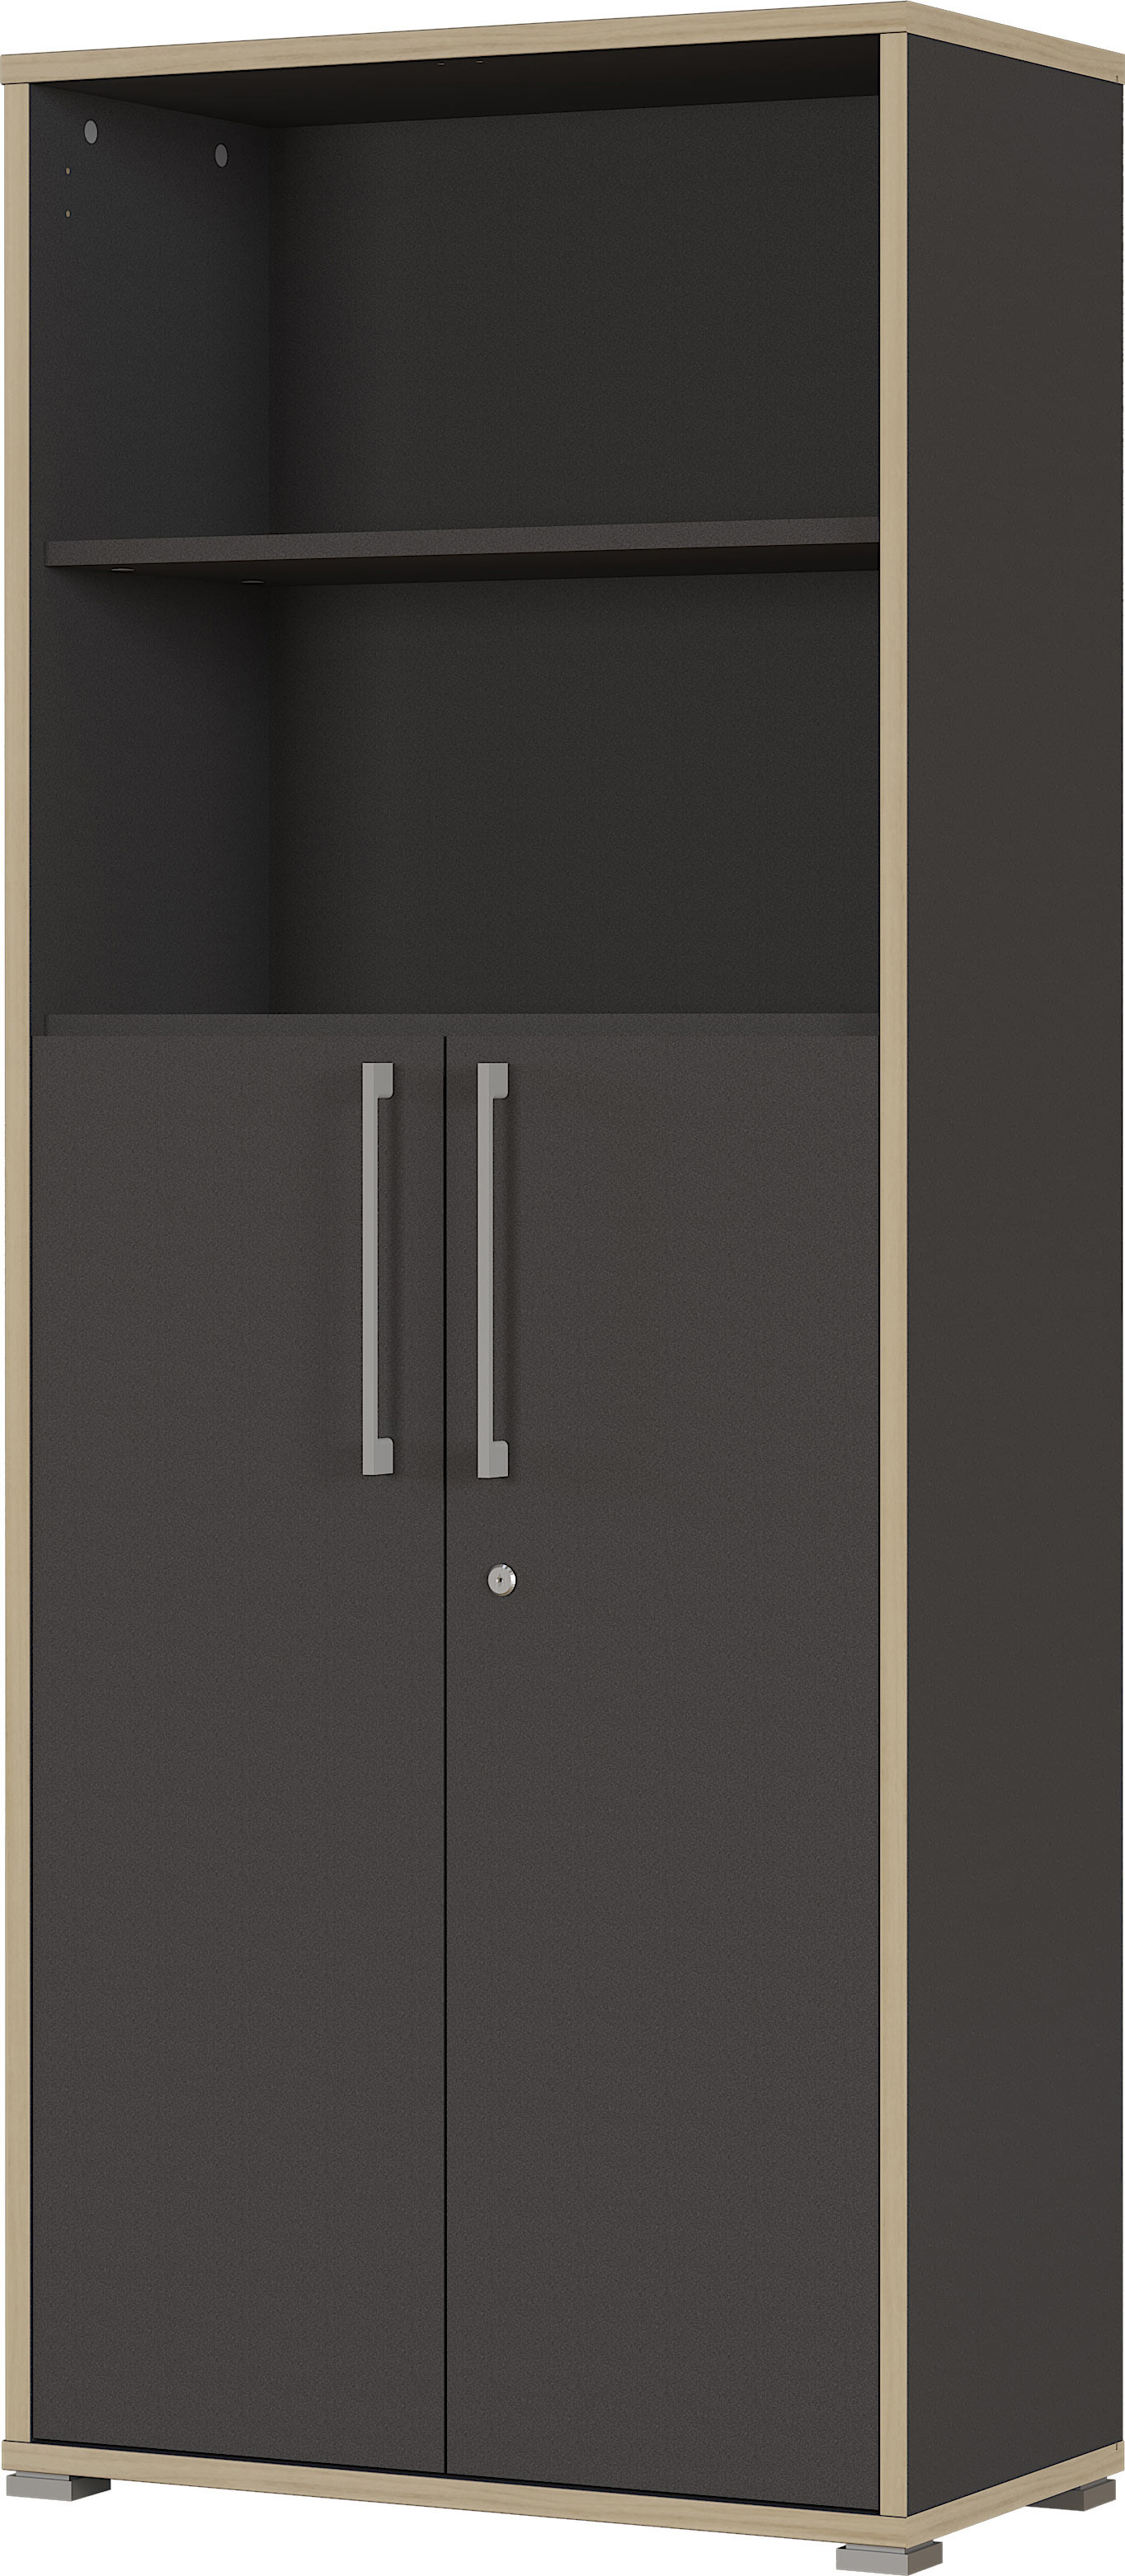 Armoire de bureau combinée contemporaine anthracite Garland